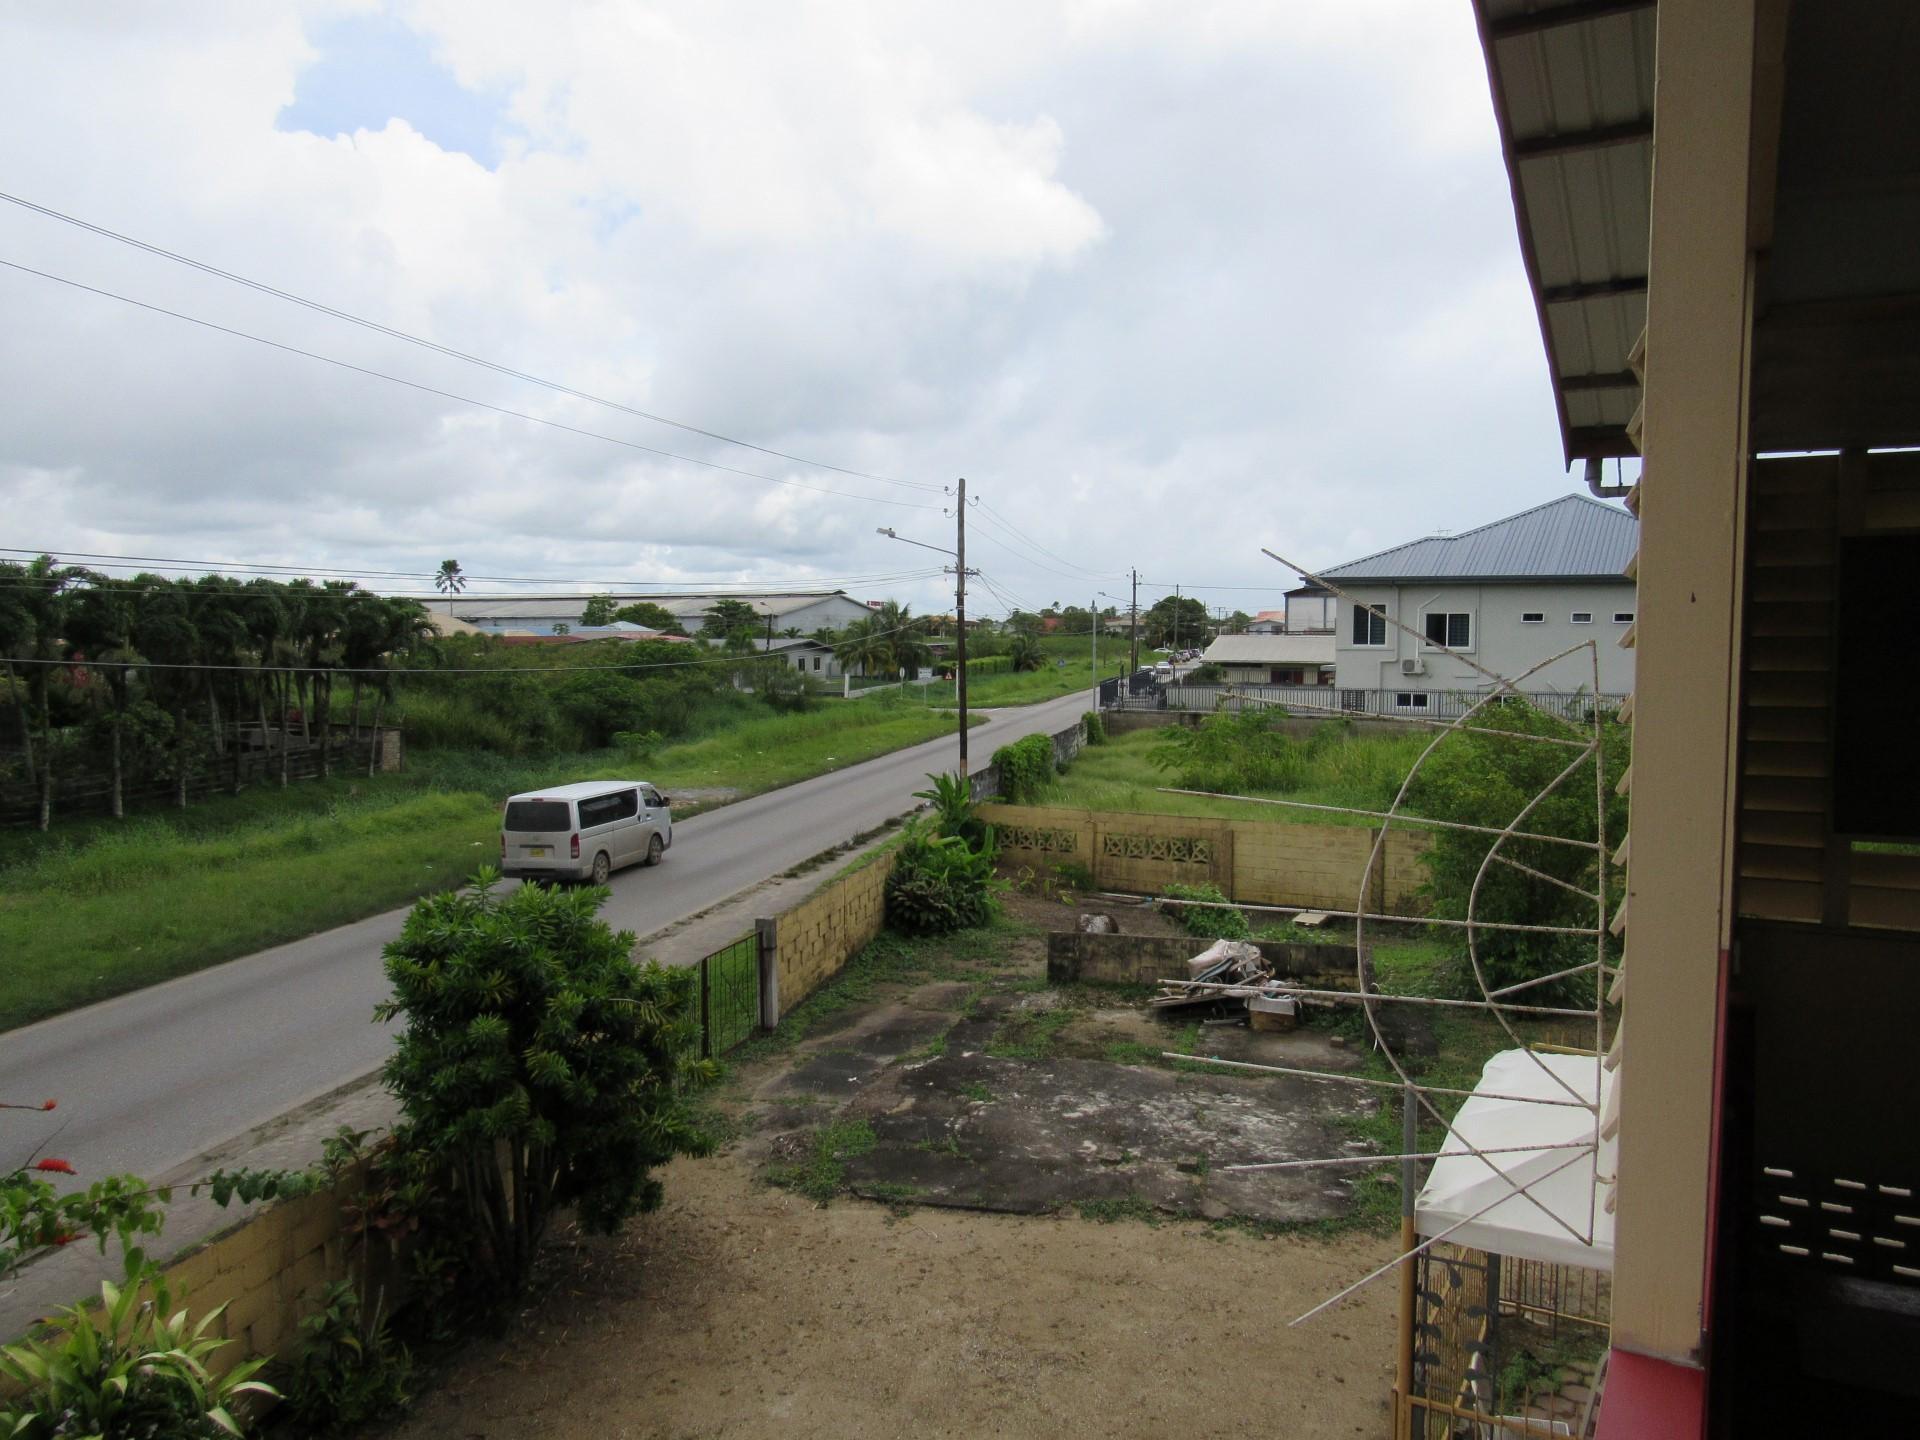 Henkielaan-32-Koopwoning-Terzol-Vastgoed-Paramaribo-Suriname-26